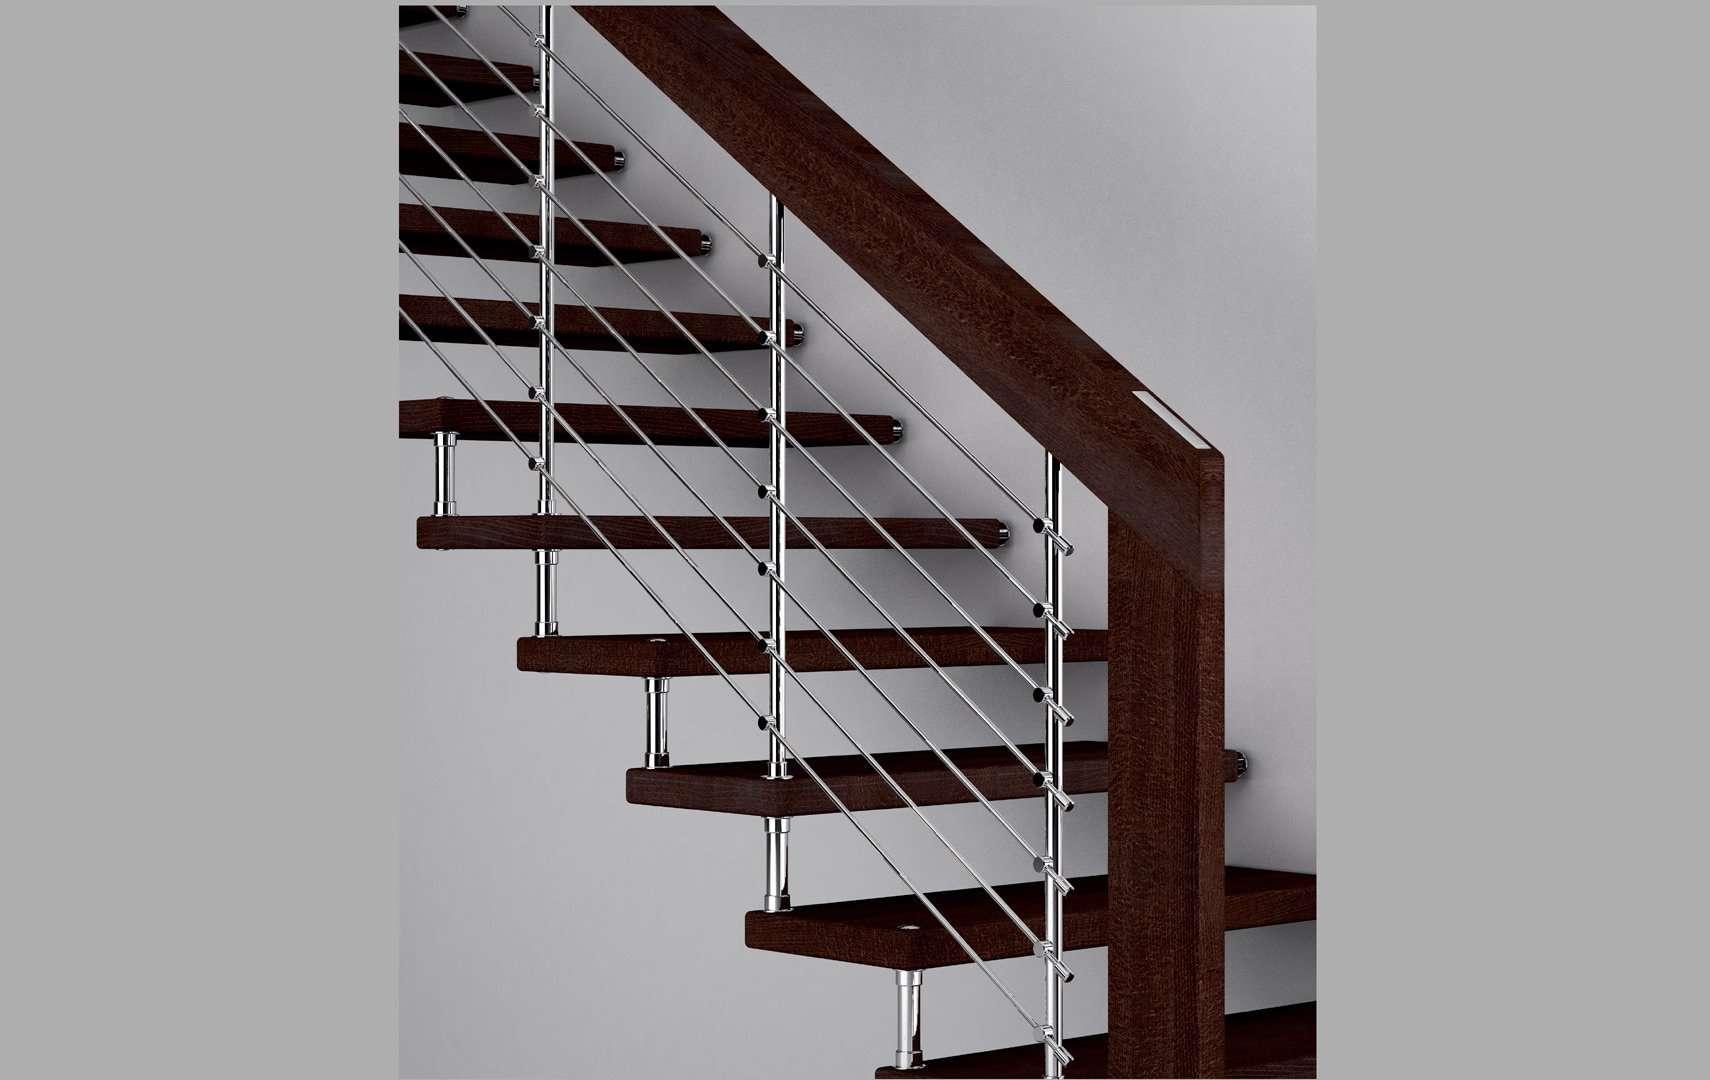 Akura escaleras italianas escaleras de madera maciza for Gradas interiores